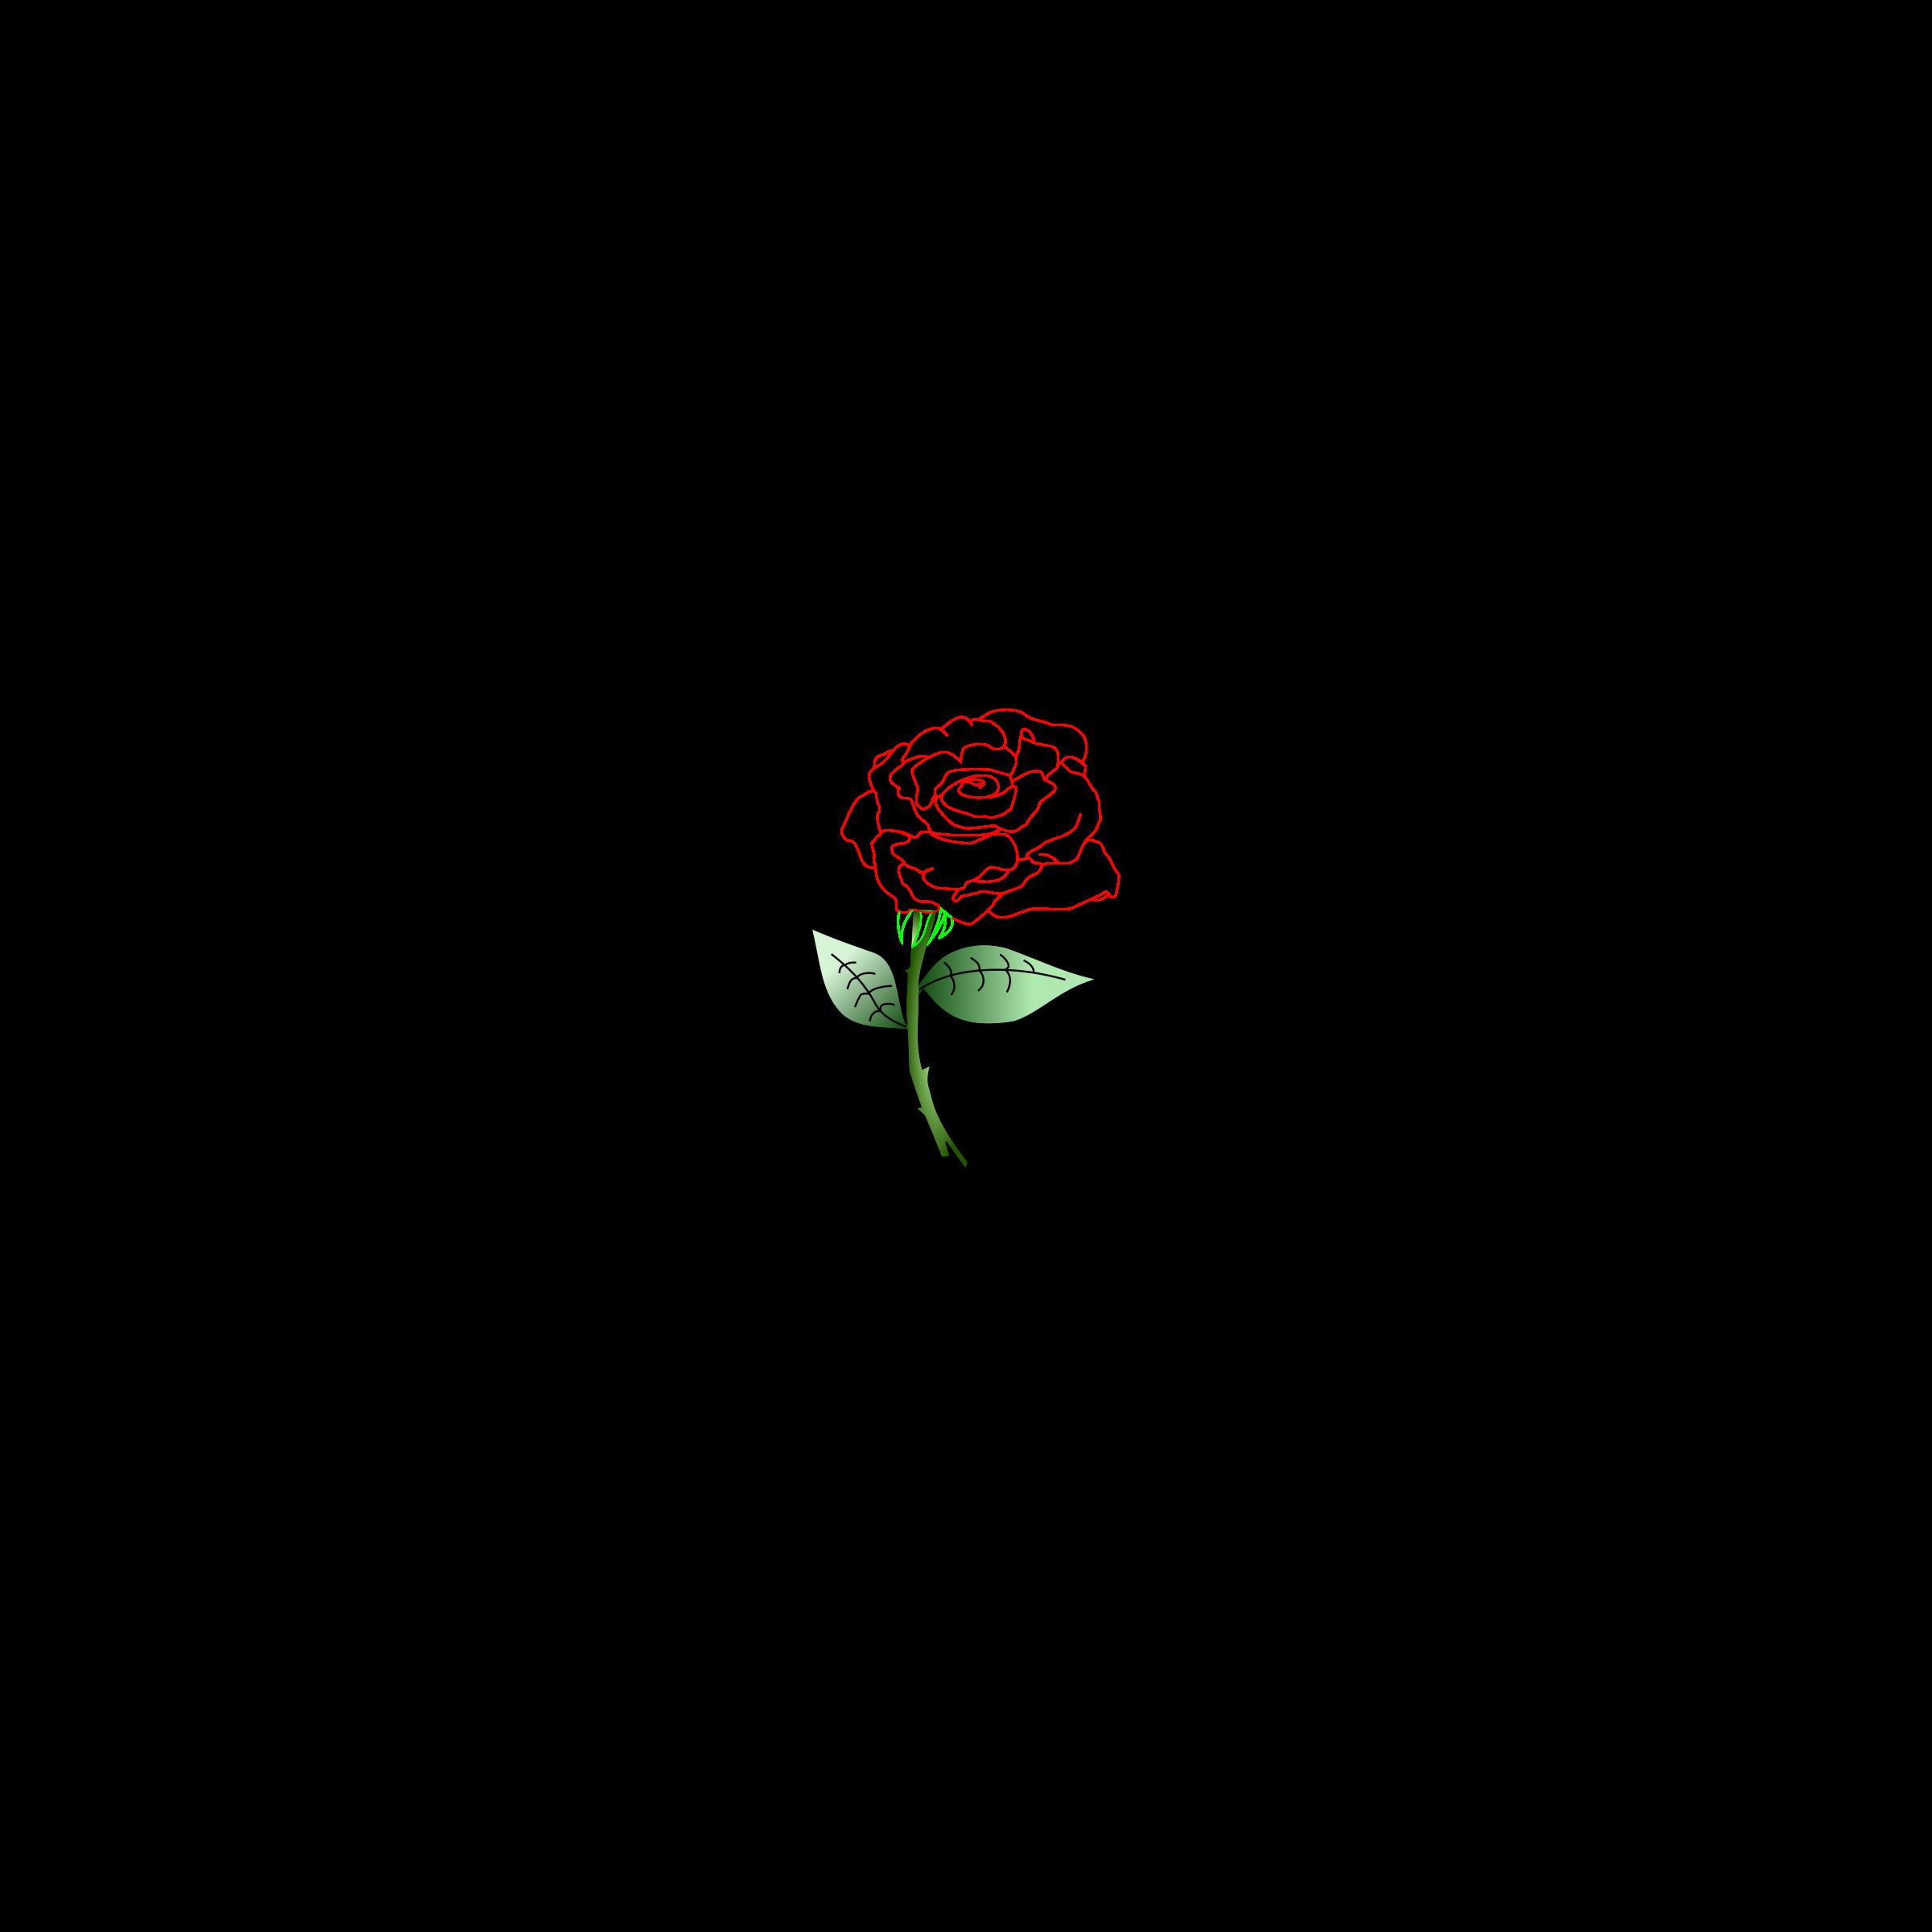 Clipart rose logo. Single big image png